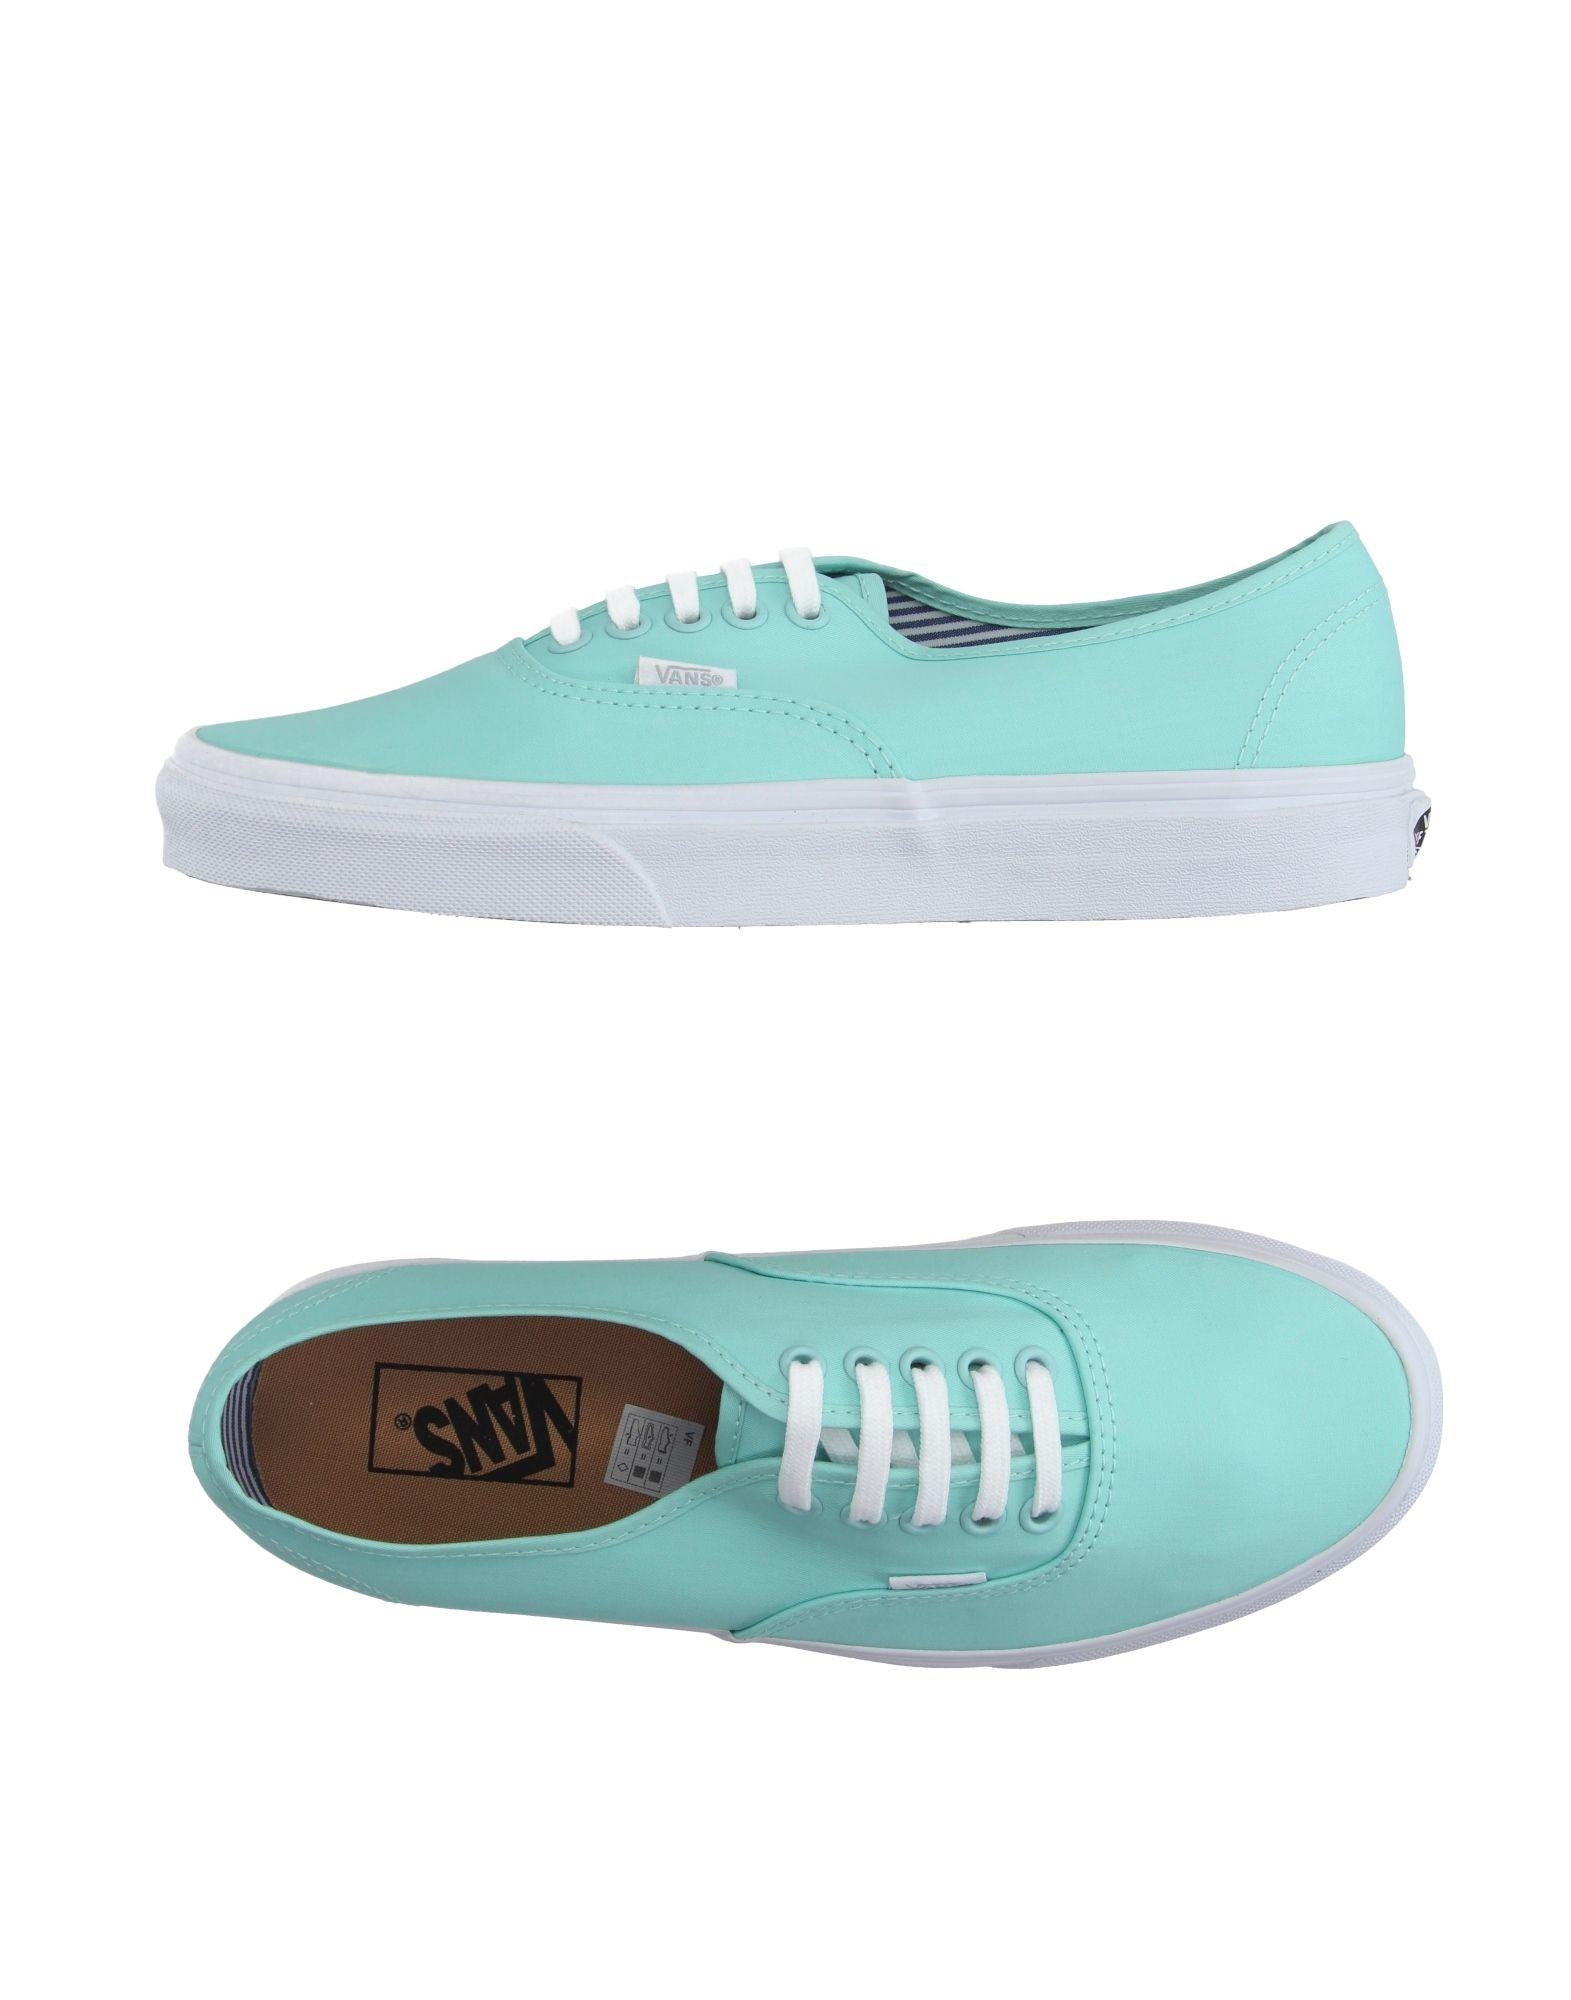 Vans Sneakers Damen  11006886XB Gute Qualität beliebte Schuhe